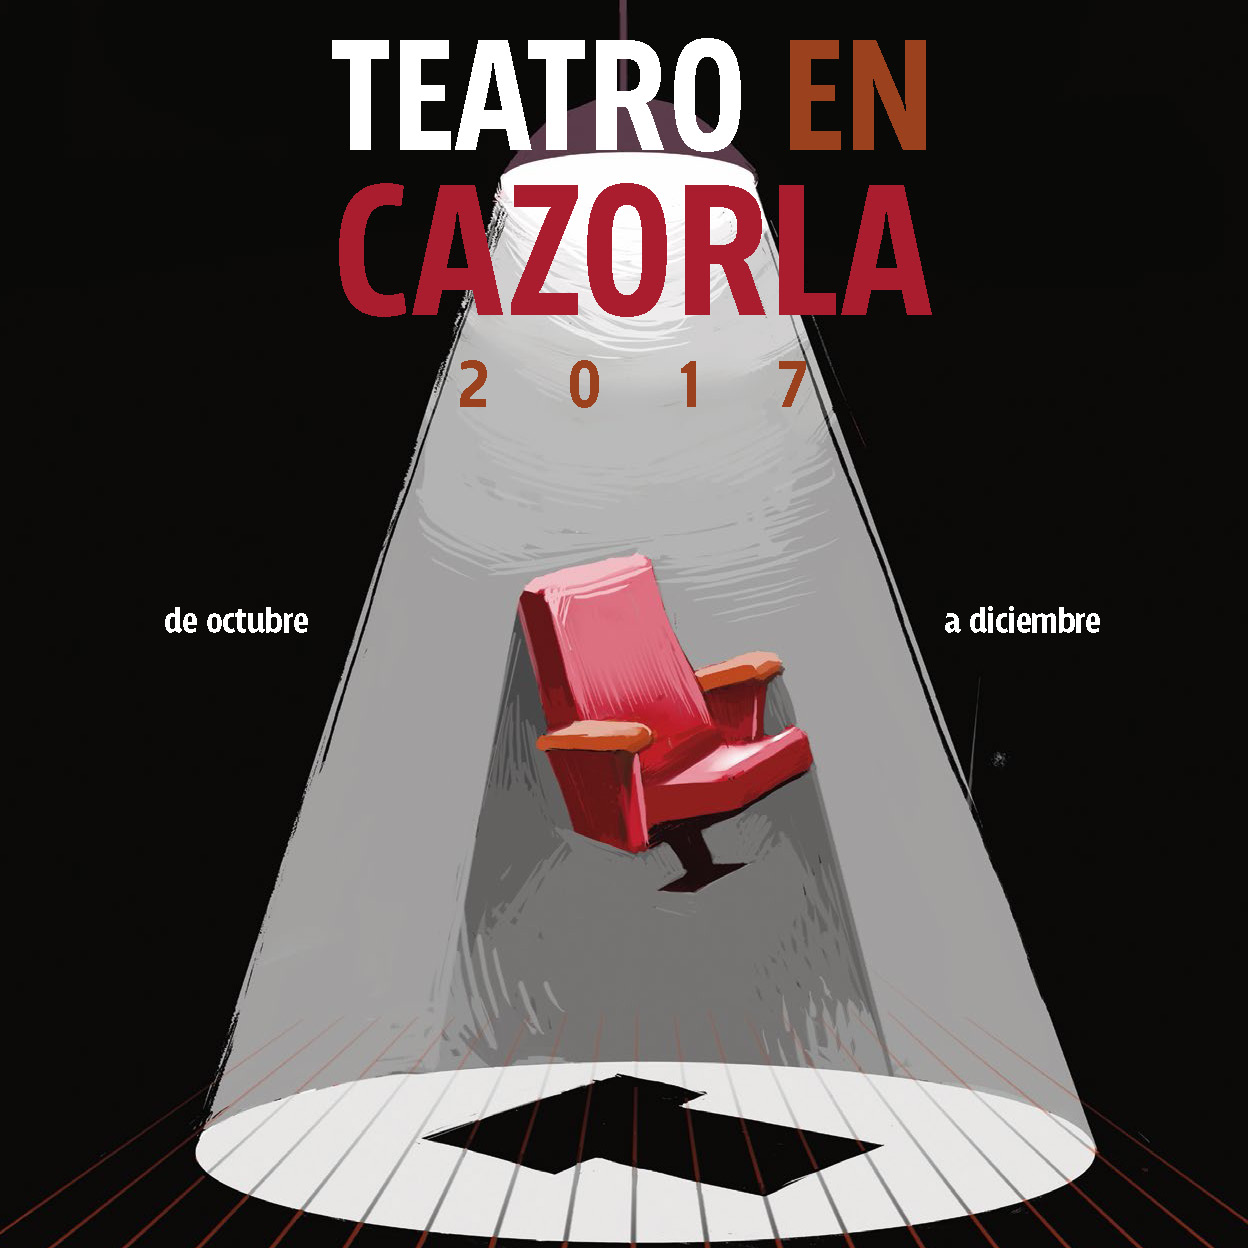 Teatro en Cazorla